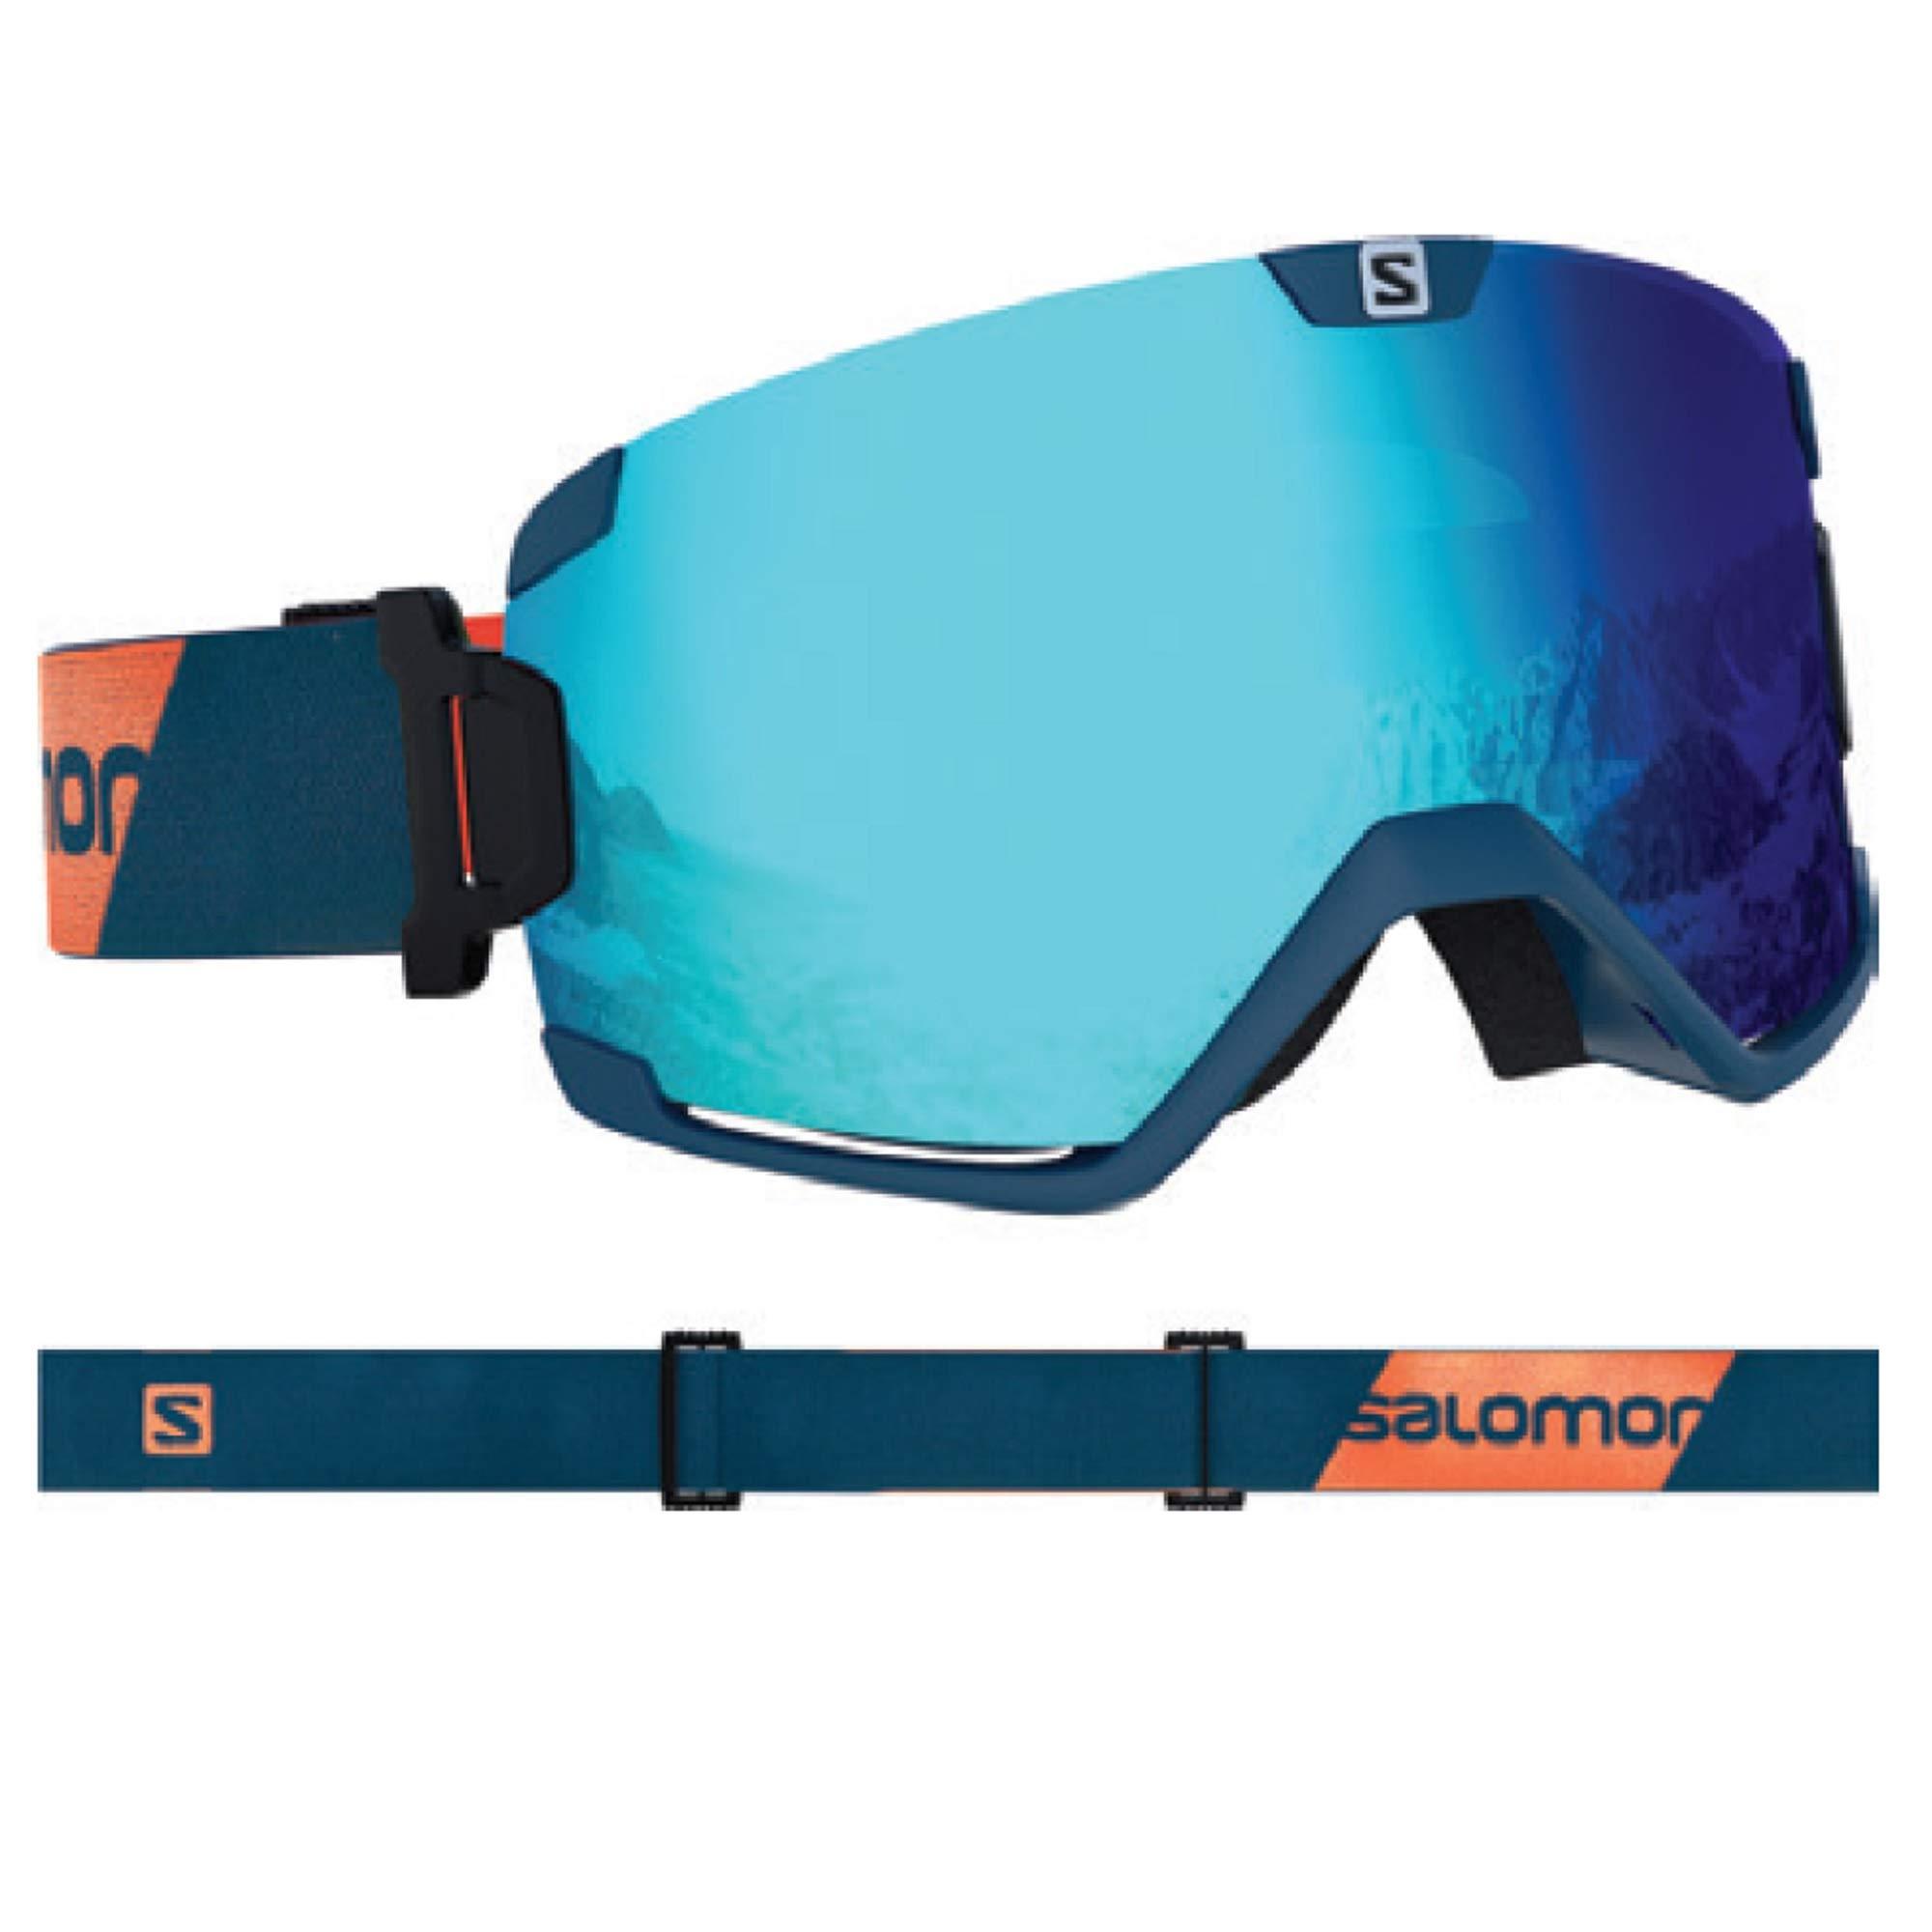 Salomon Cosmic Goggles Moroccan Universal